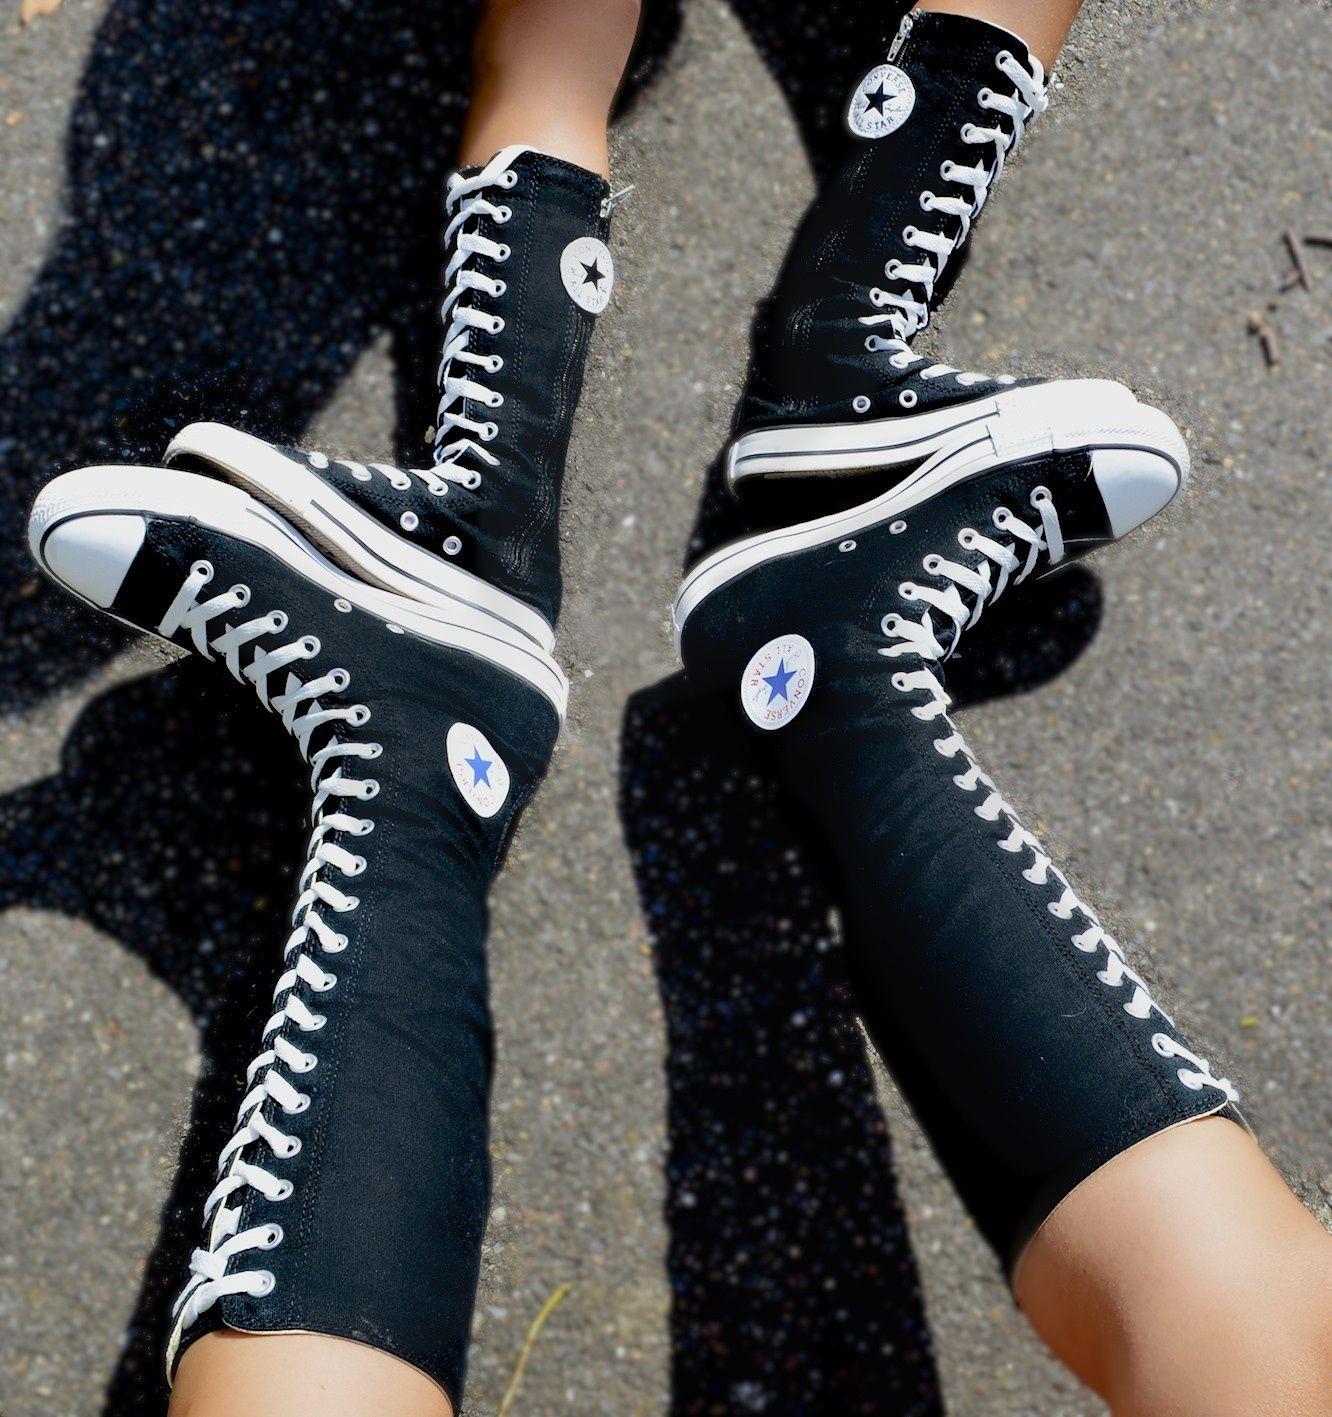 xxhi knee high converse converse boots